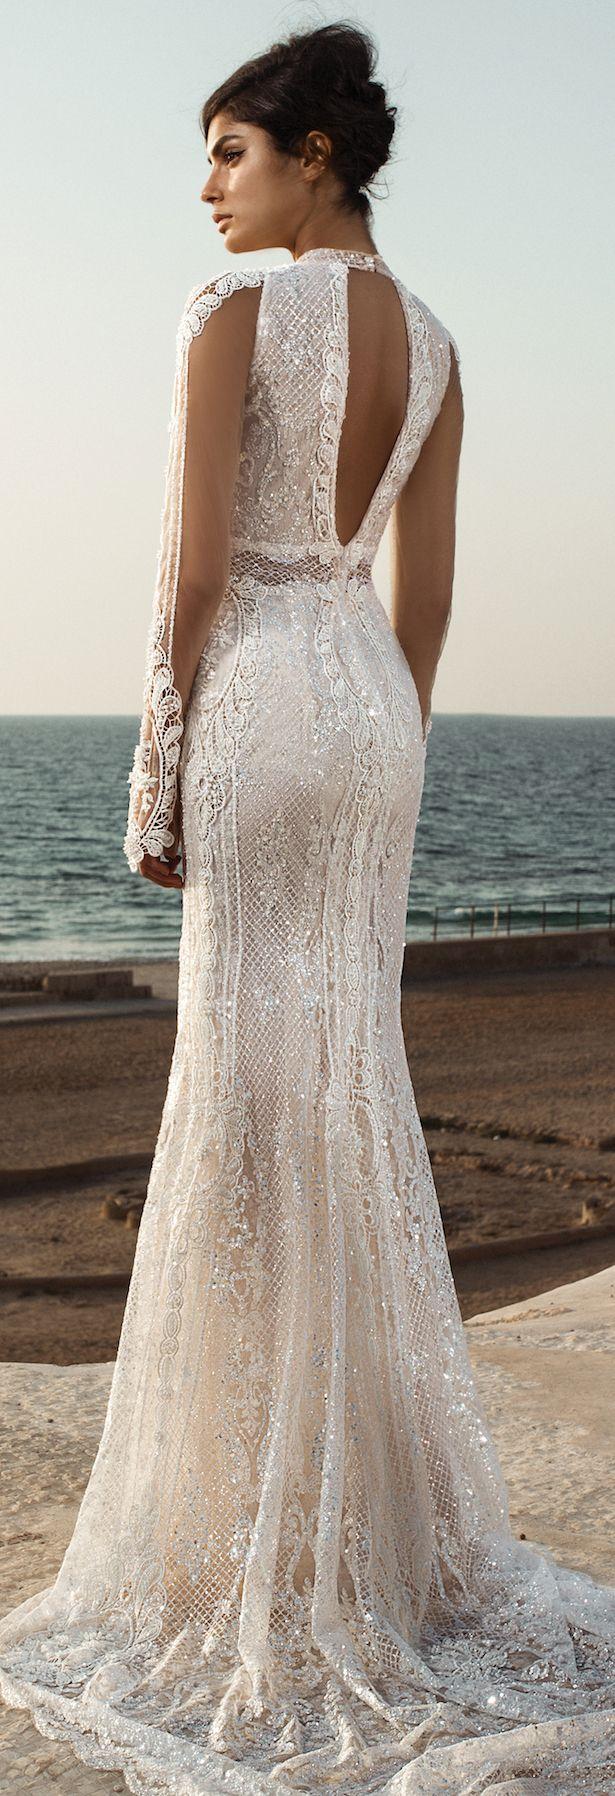 Lace button up wedding dress november 2018 GALA by Galia Lahav Collection NO III Wedding Dresses  Wedding